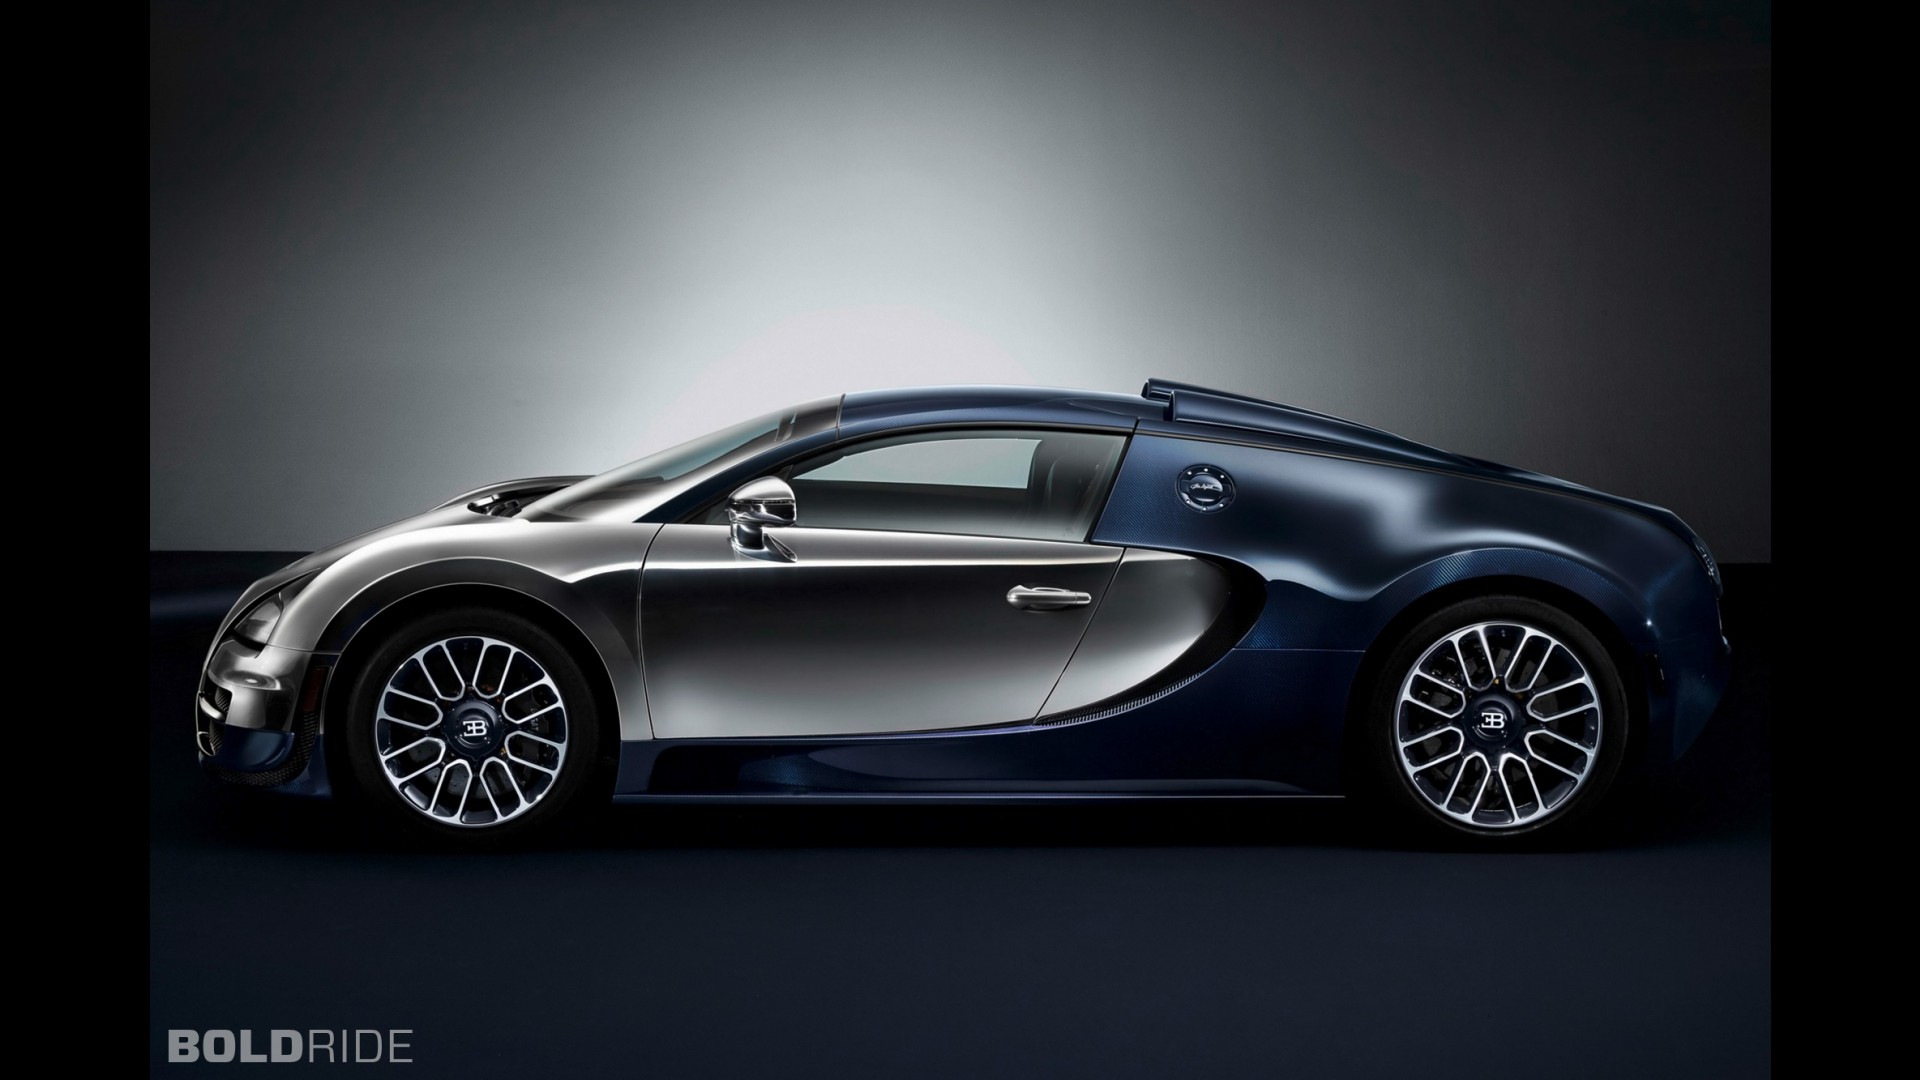 bugatti-veyron-grand-sport-vitesse-legend-ettore-bugatti Astounding Bugatti Veyron Grand Sport Vitesse Hd Cars Trend